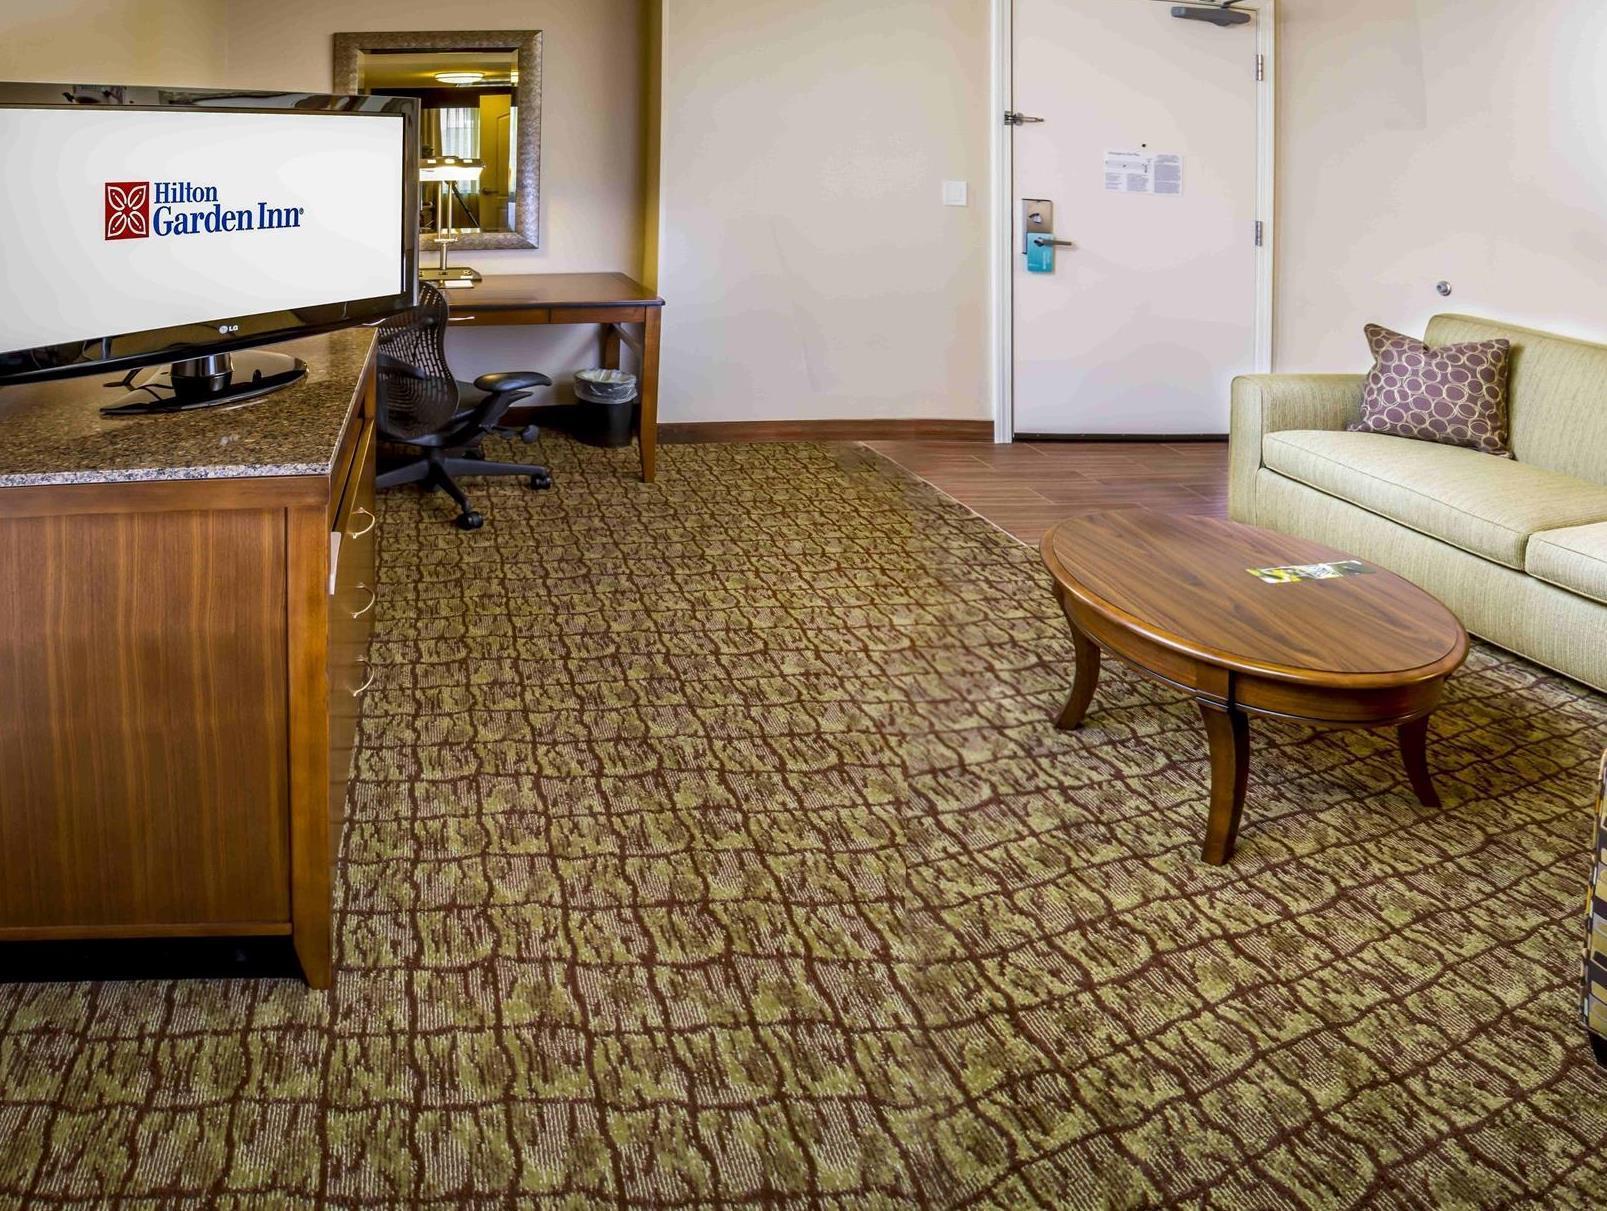 More About Hilton Garden Inn Boise Spectrum Hotel